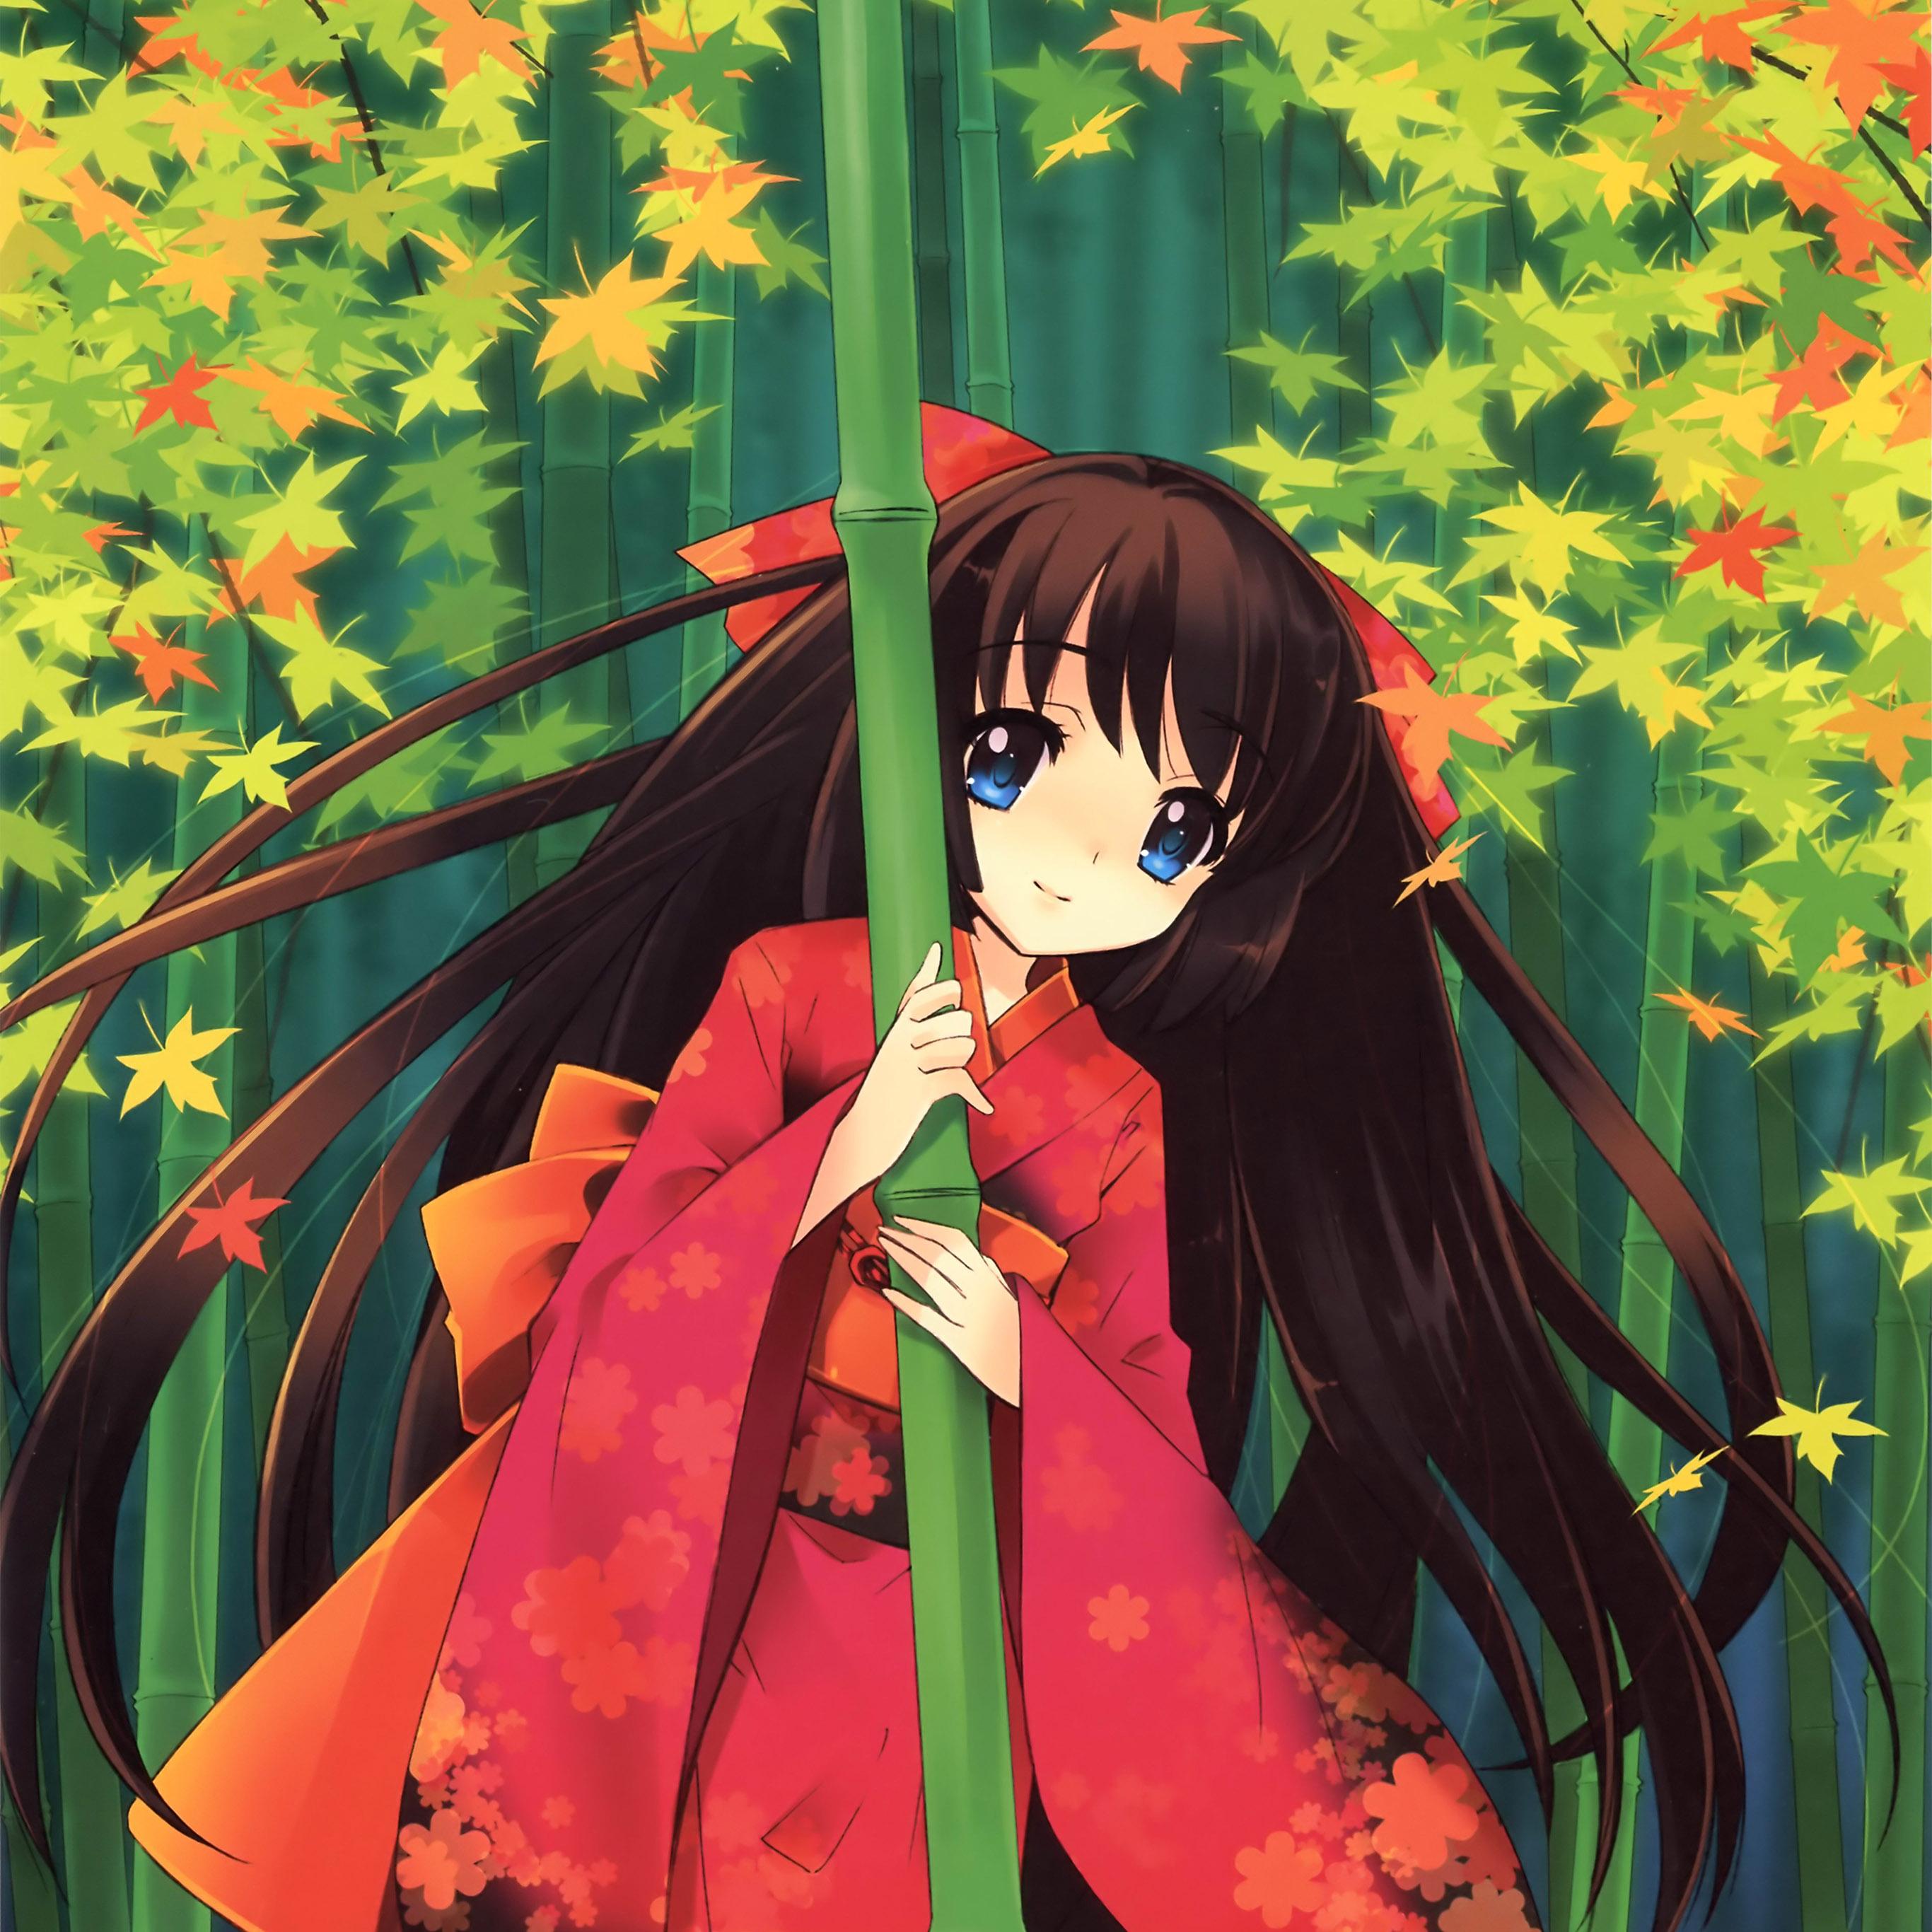 Cute Anime Wallpapers: Aq46-anime-girl-japan-art-cute